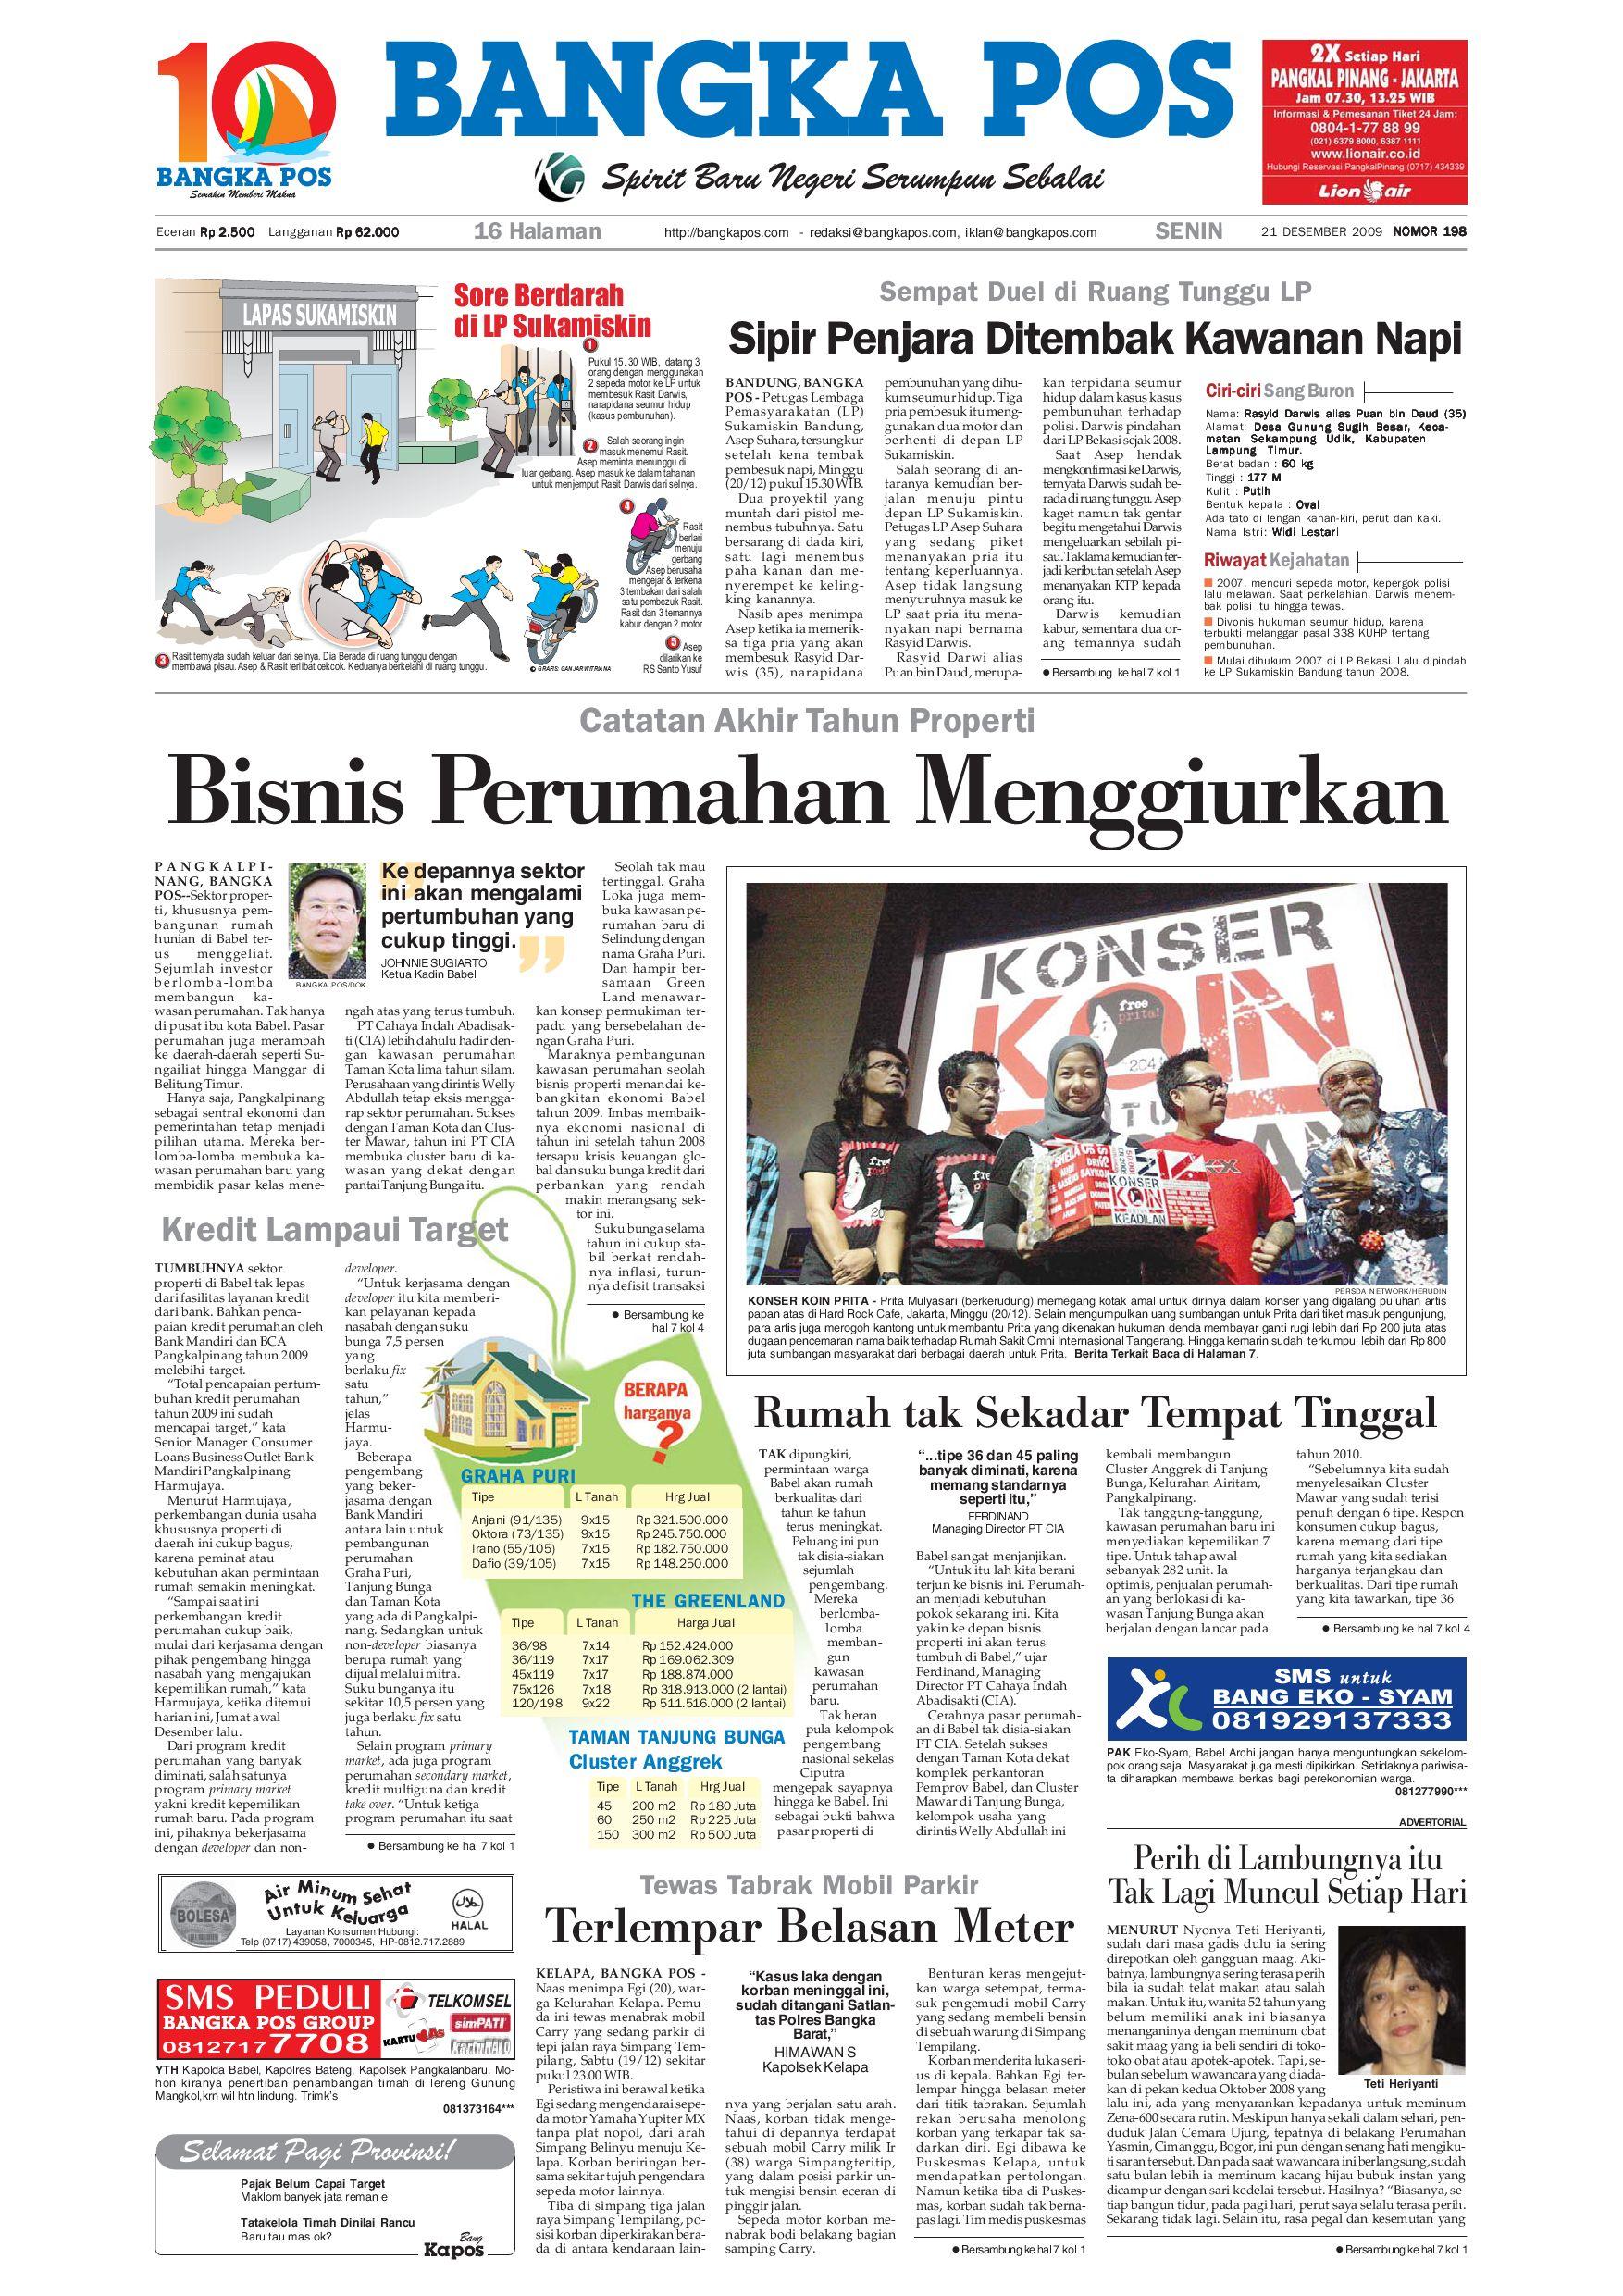 Harian Pagi Bangka Pos Edisi 21 Desember 2009 By Issuu Parcel Makanan Ampamp Keramik Pja 1608